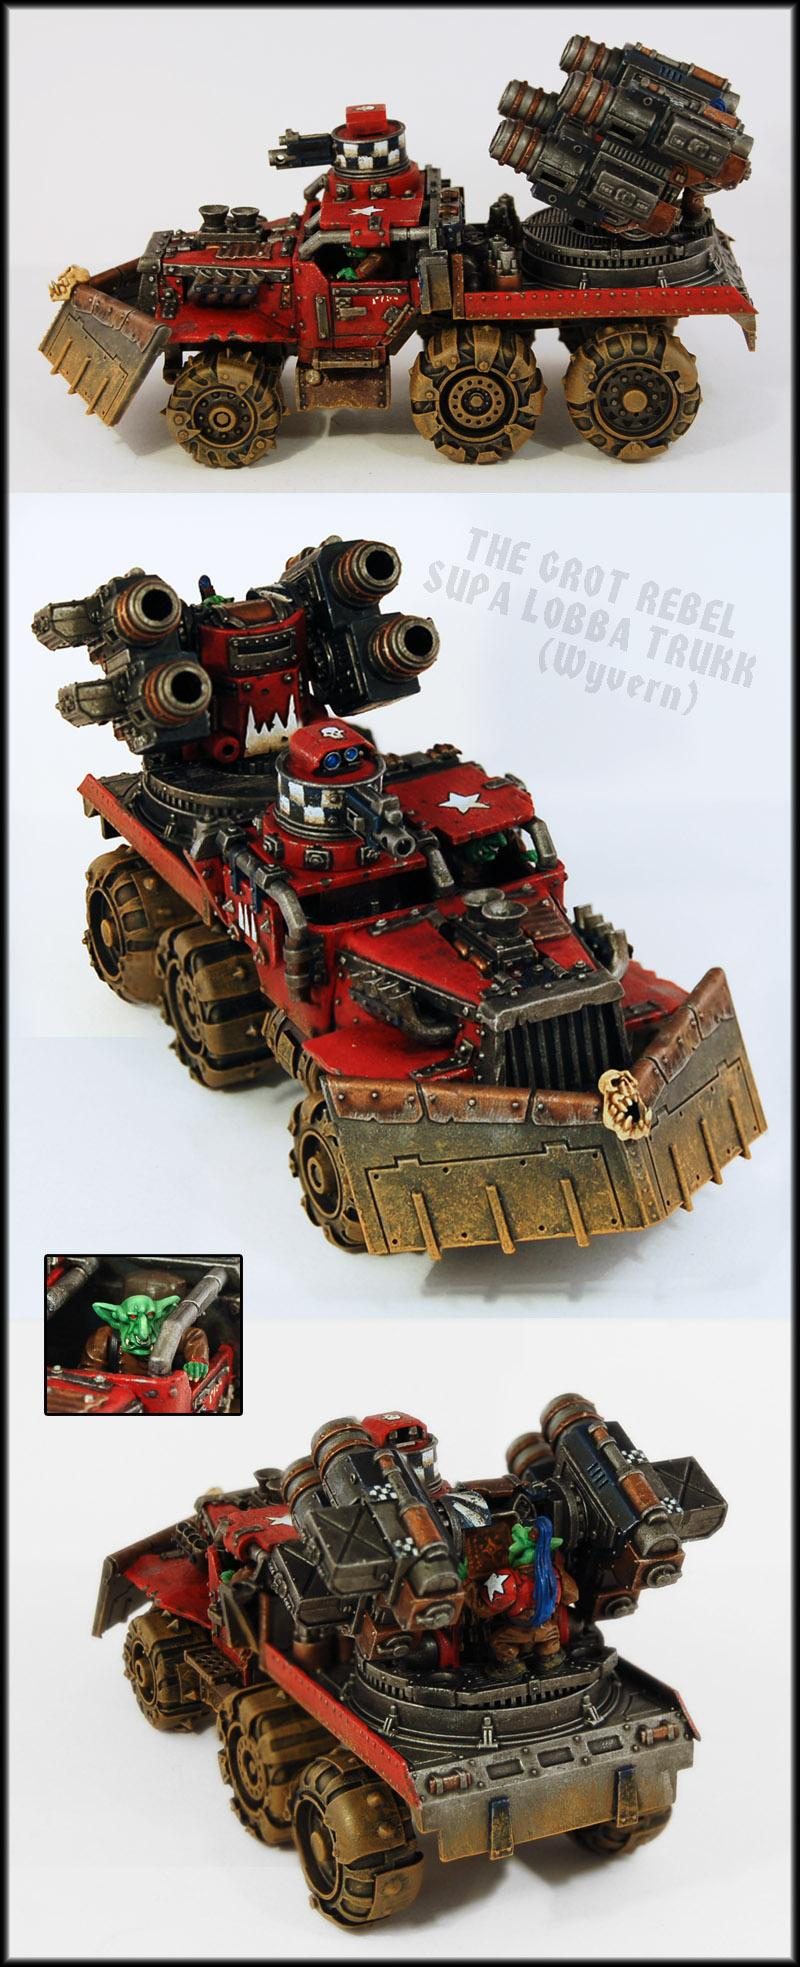 Armor, Forge World, Goblins, Greenskins, Grots, Gunwagon, Mortar, Orks, Tank, Trukk, Wagons, Warhammer 40,000, Wyvern